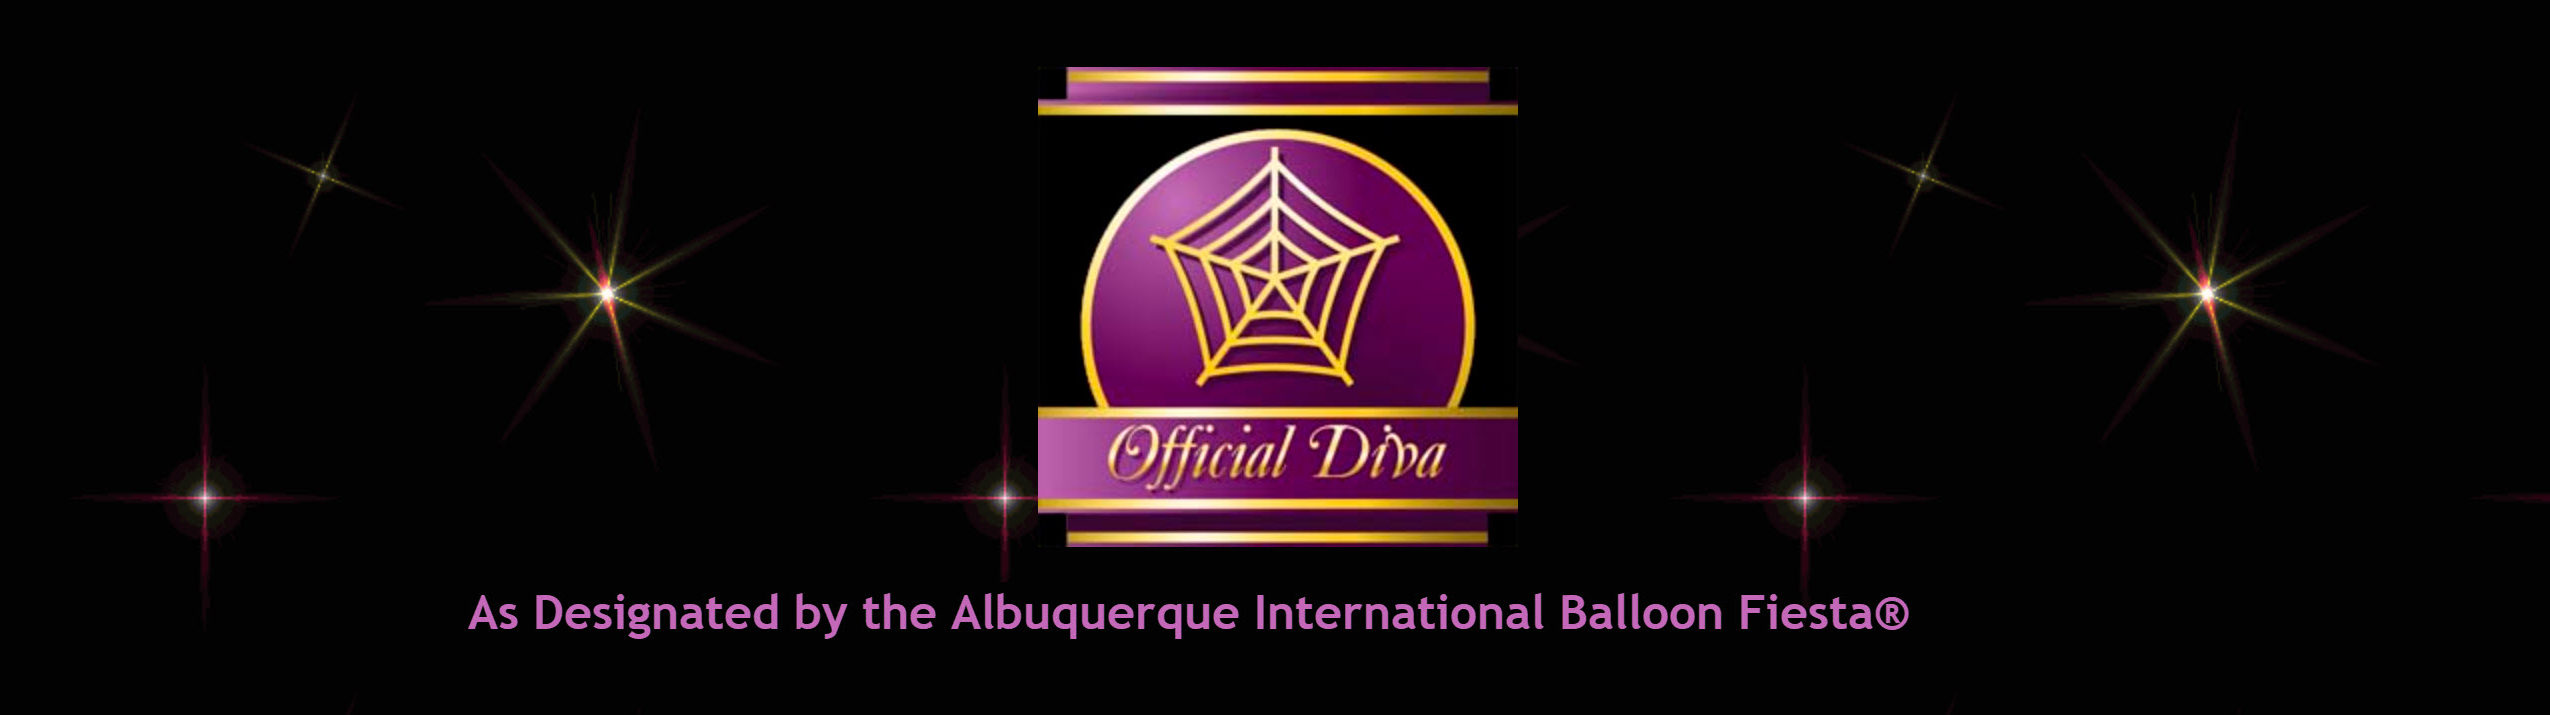 Official Diva